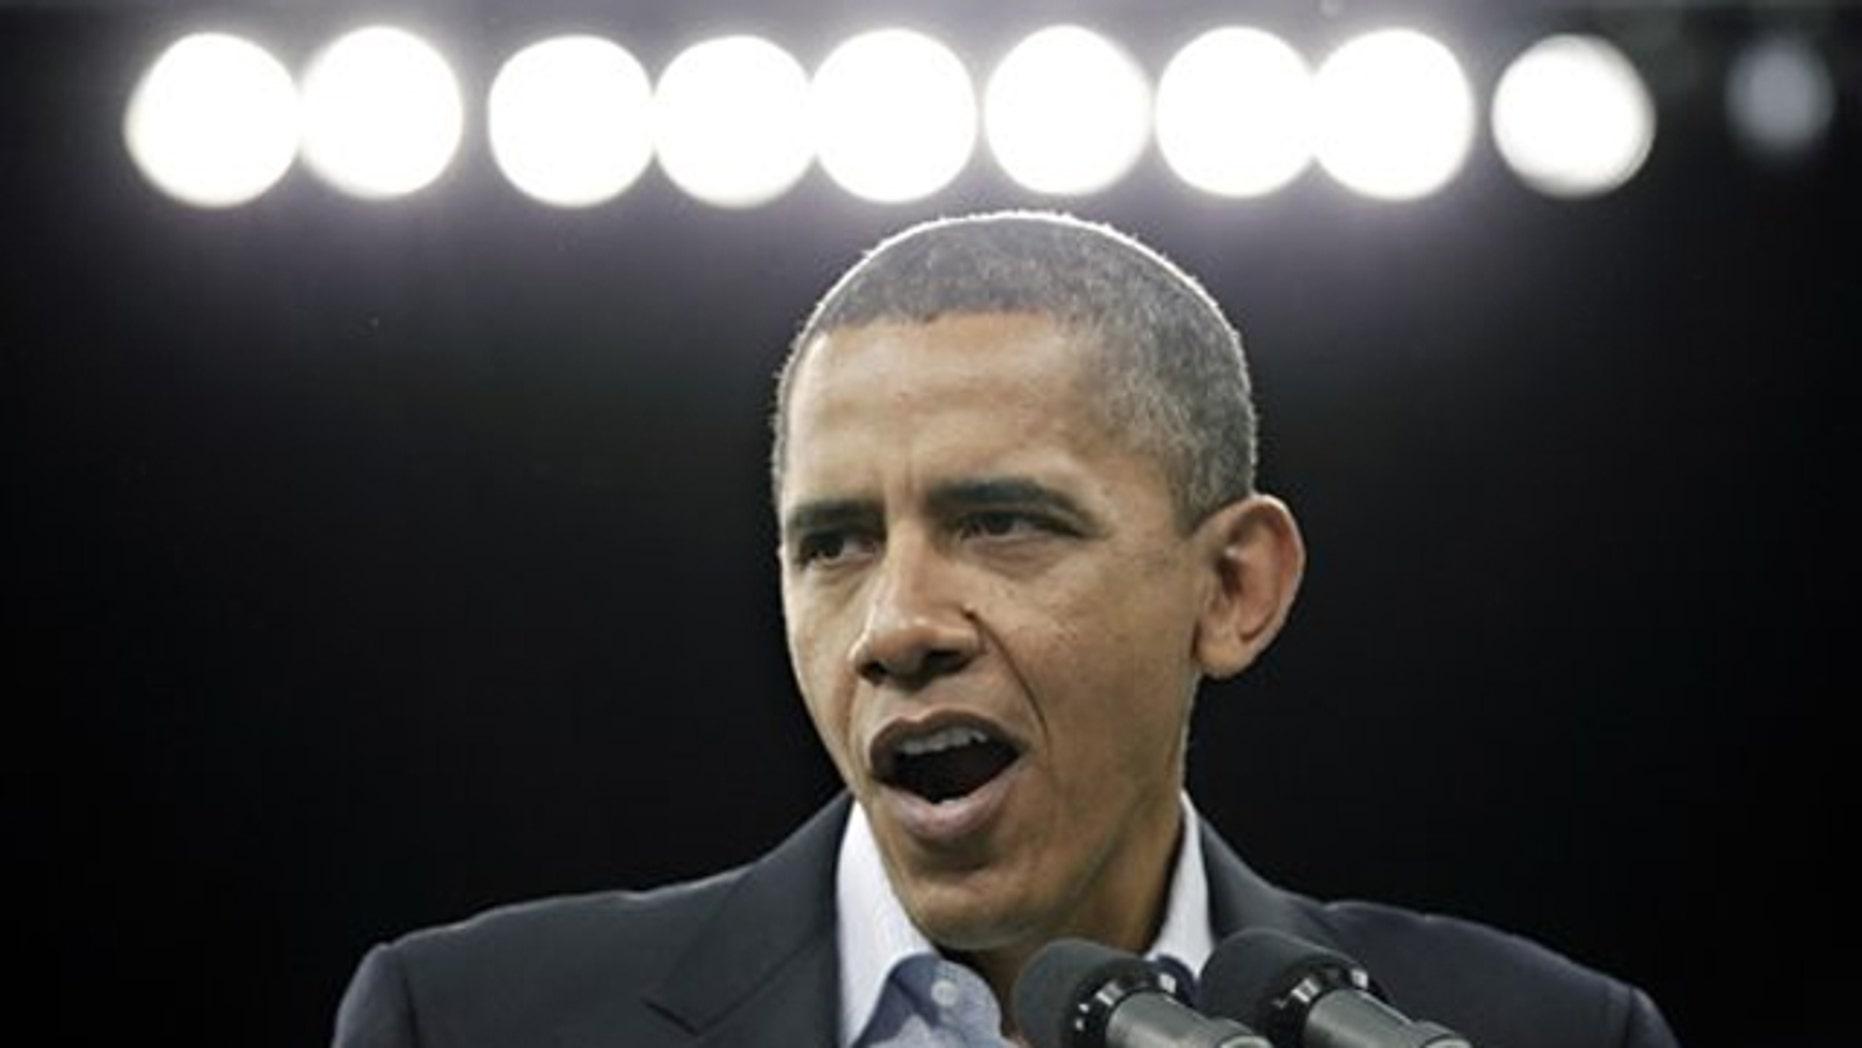 Sunday: President Obama speaks at a rally at Cleveland State University.